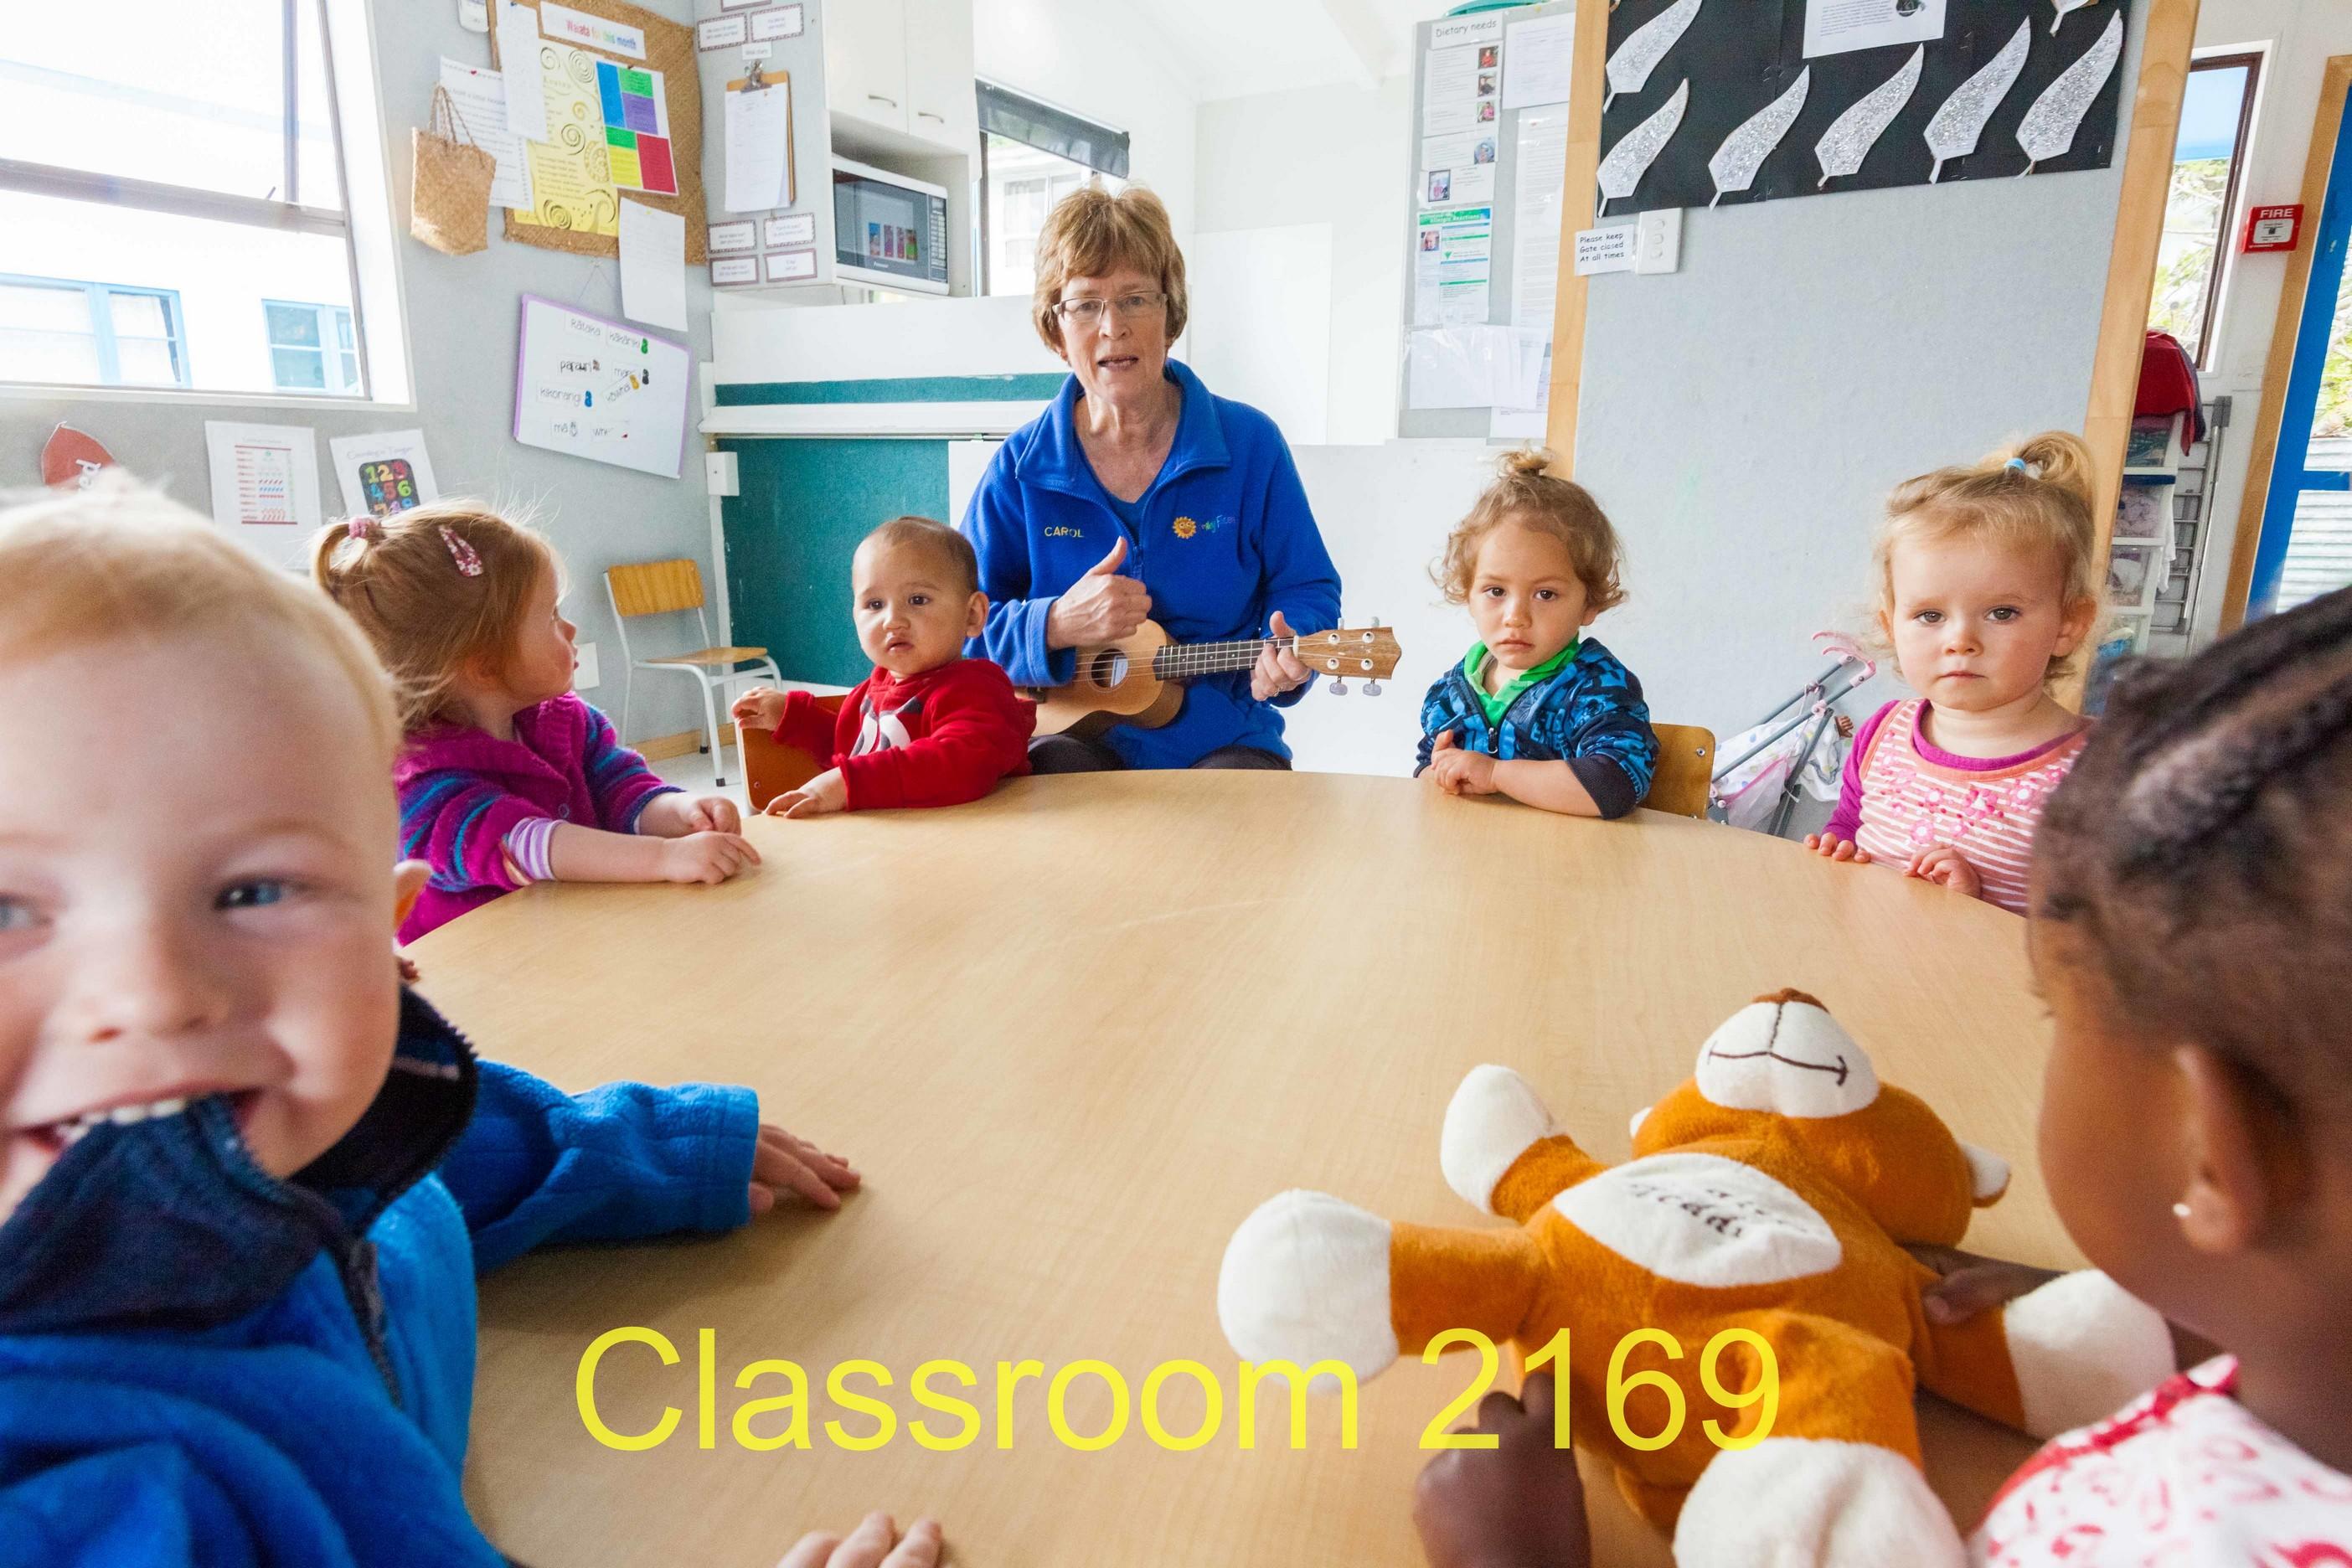 Classroom 2169